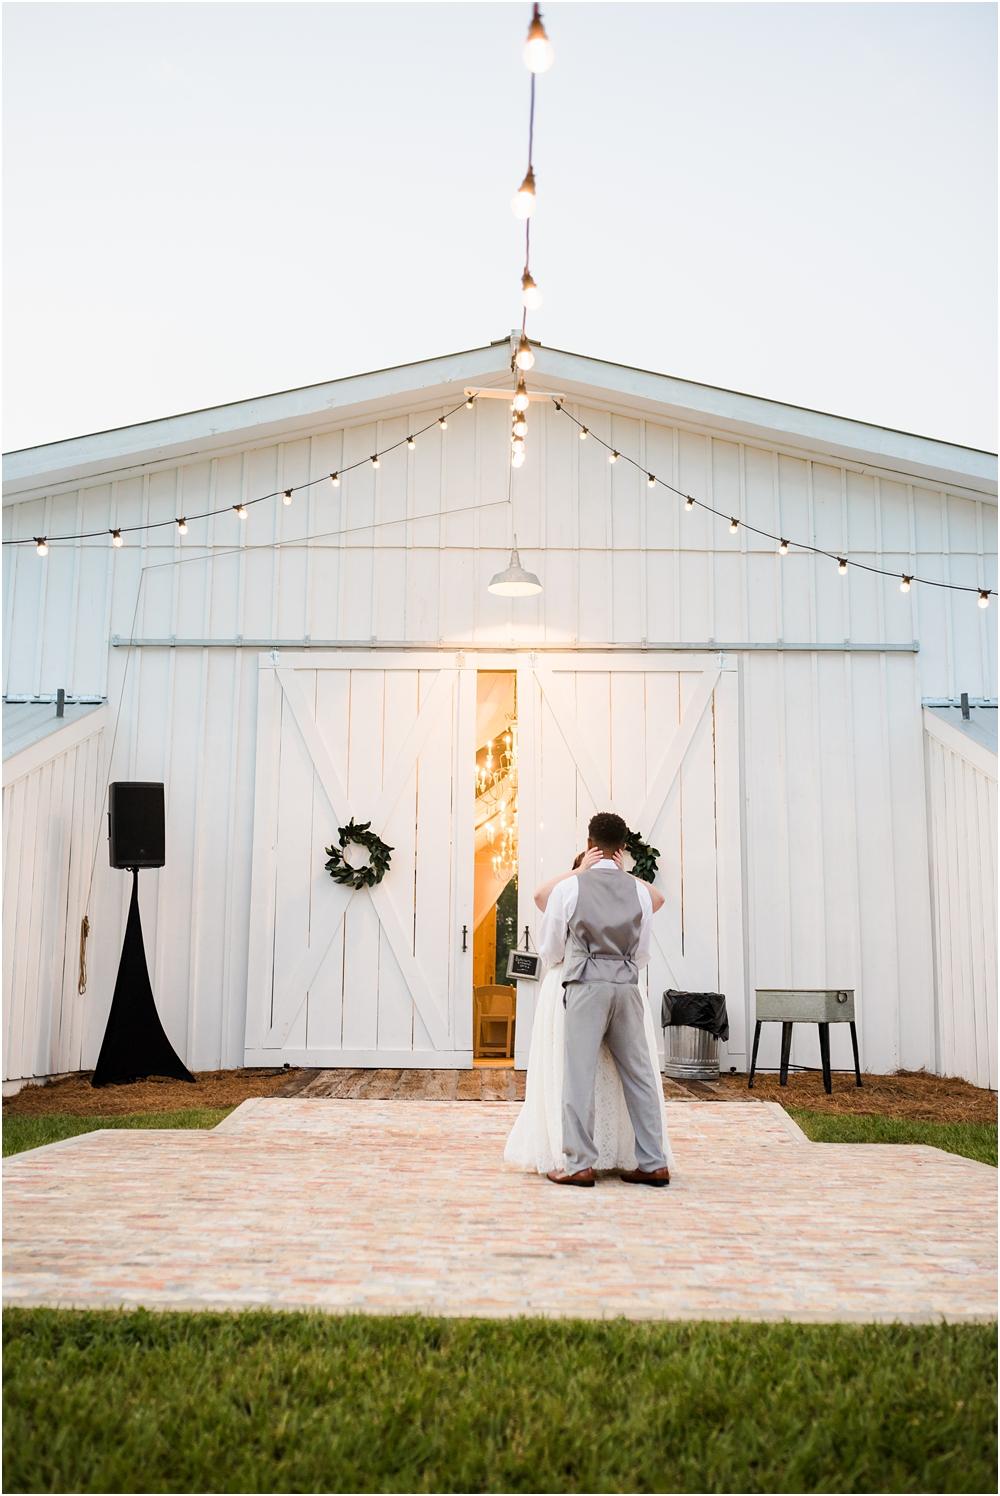 mosley-wedding-kiersten-stevenson-photography-30a-panama-city-beach-dothan-tallahassee-(355-of-472).JPG